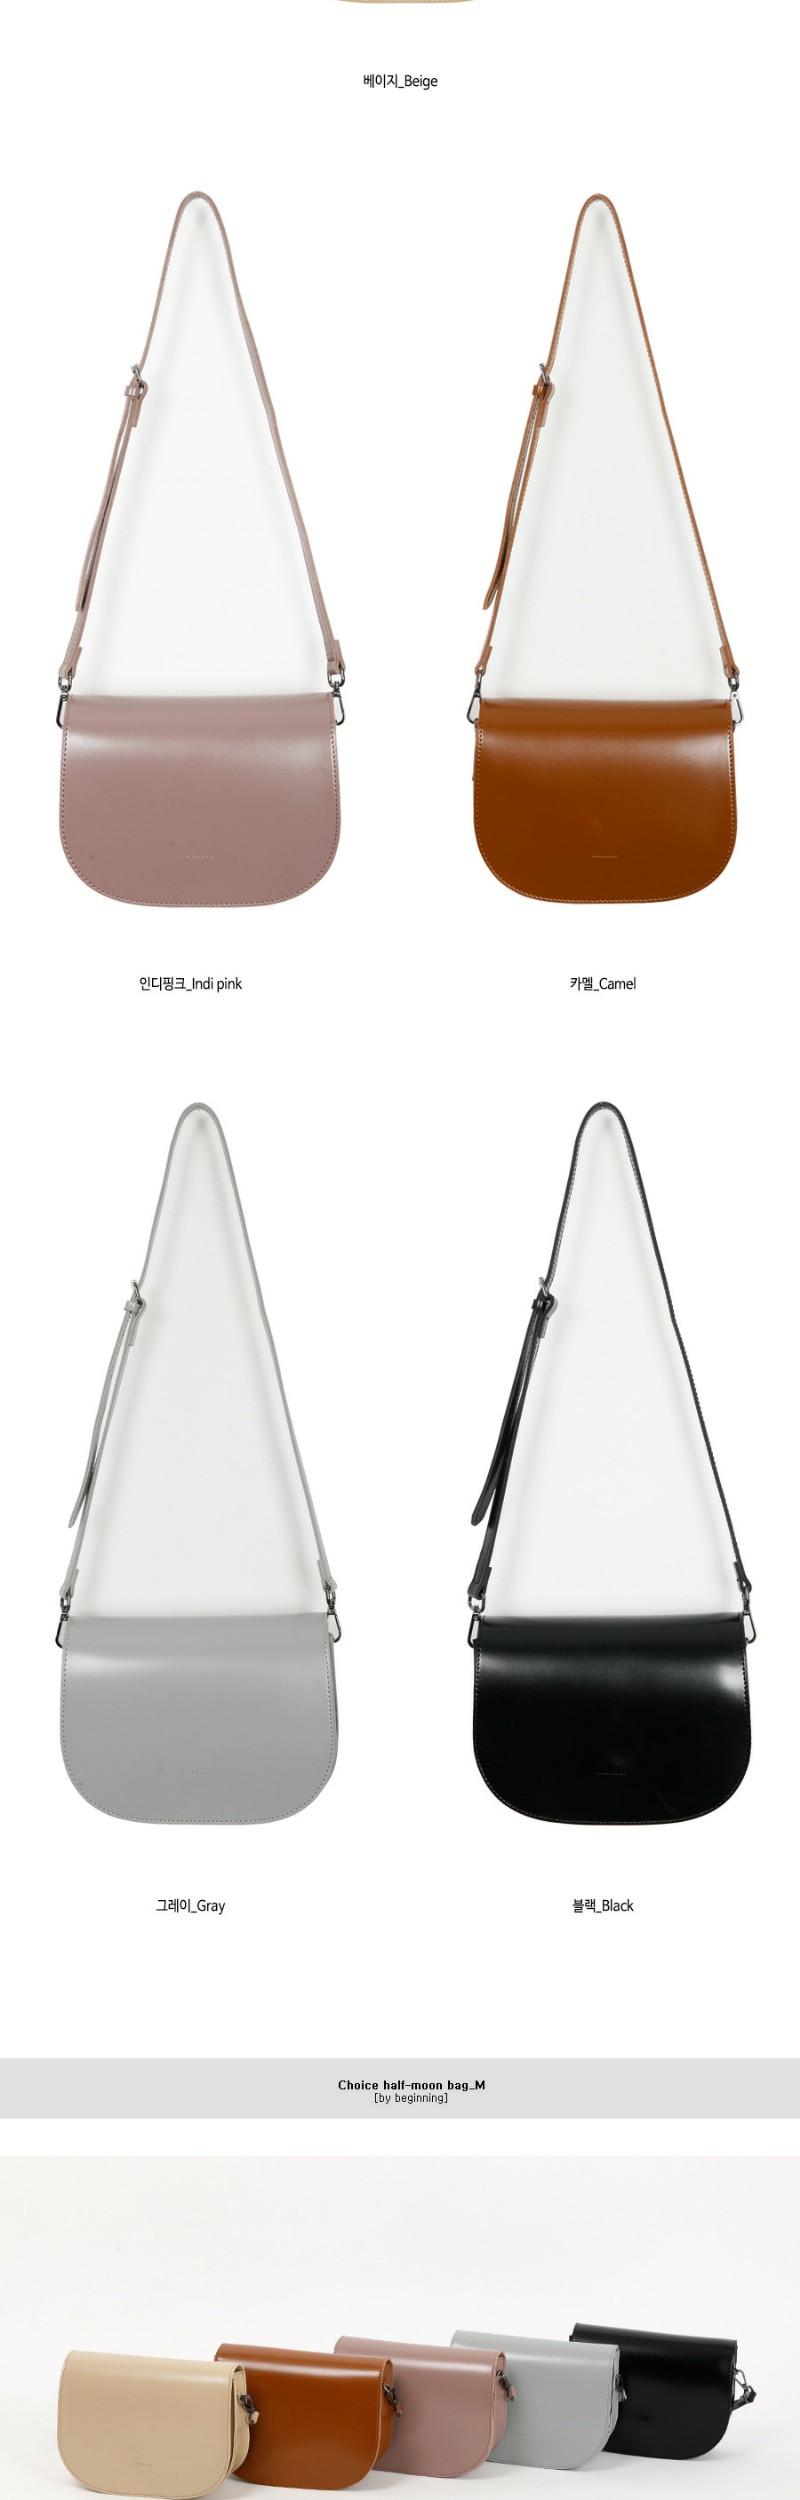 Choice half-moon bag_M (size : one)